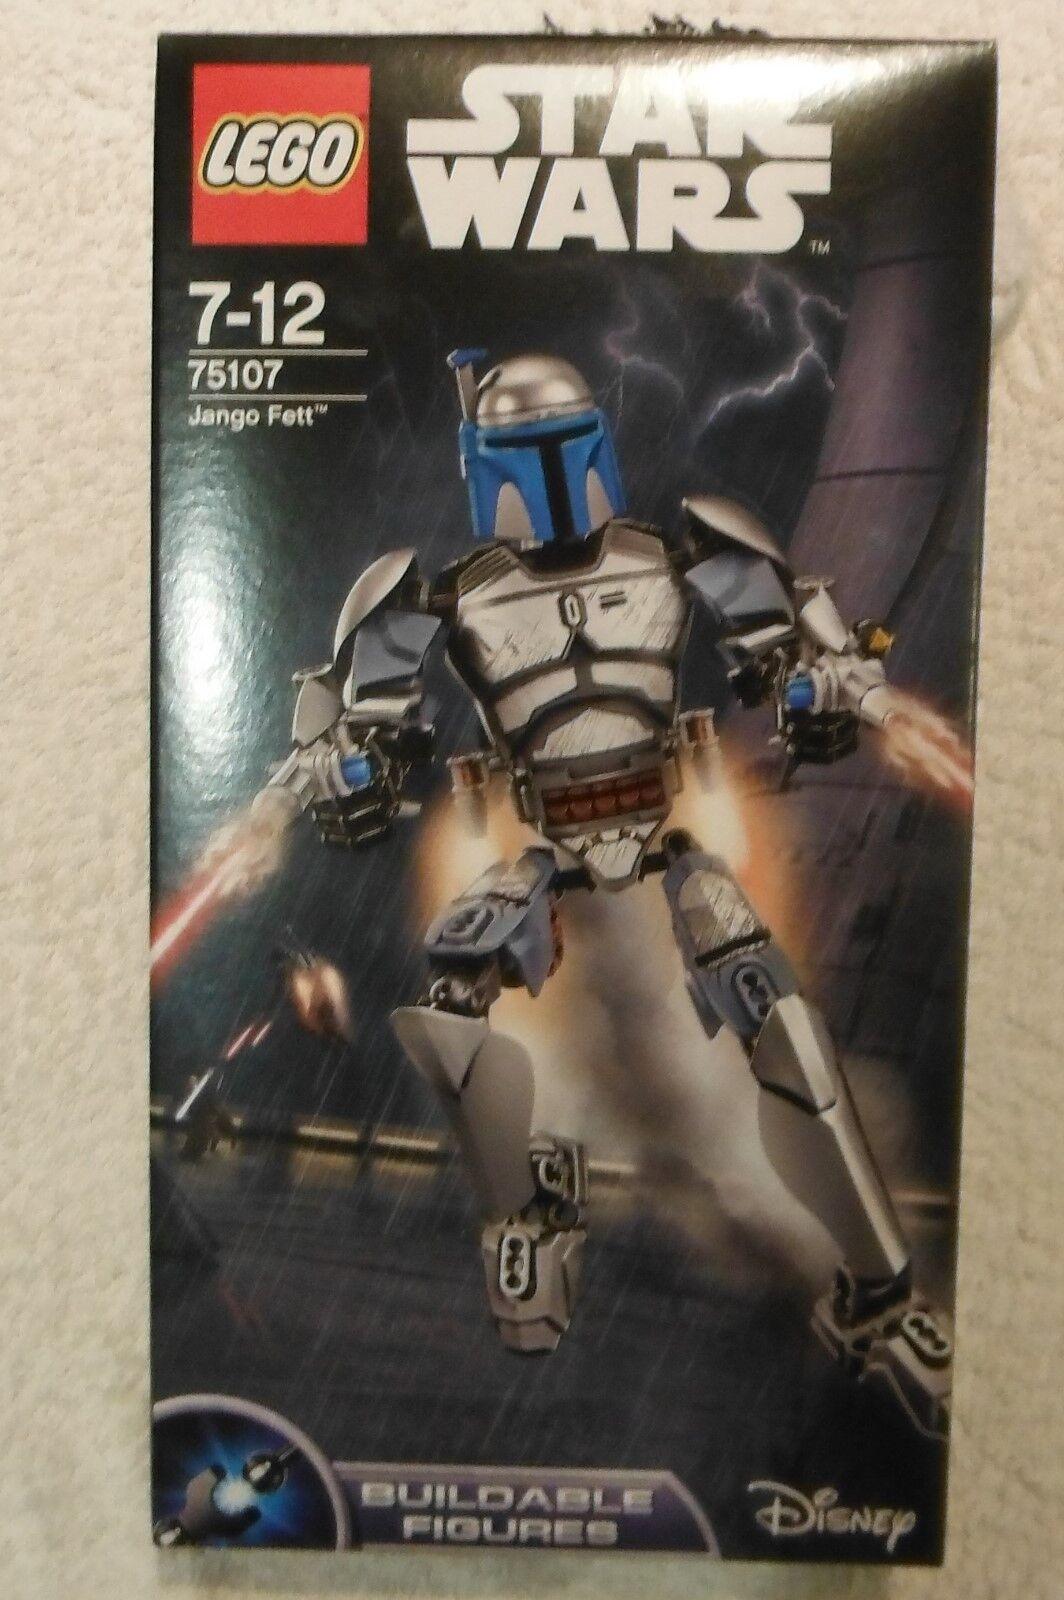 Star Wars Lego Jango Fett 75107 Rare Retired Buildable Figure Set Brand New